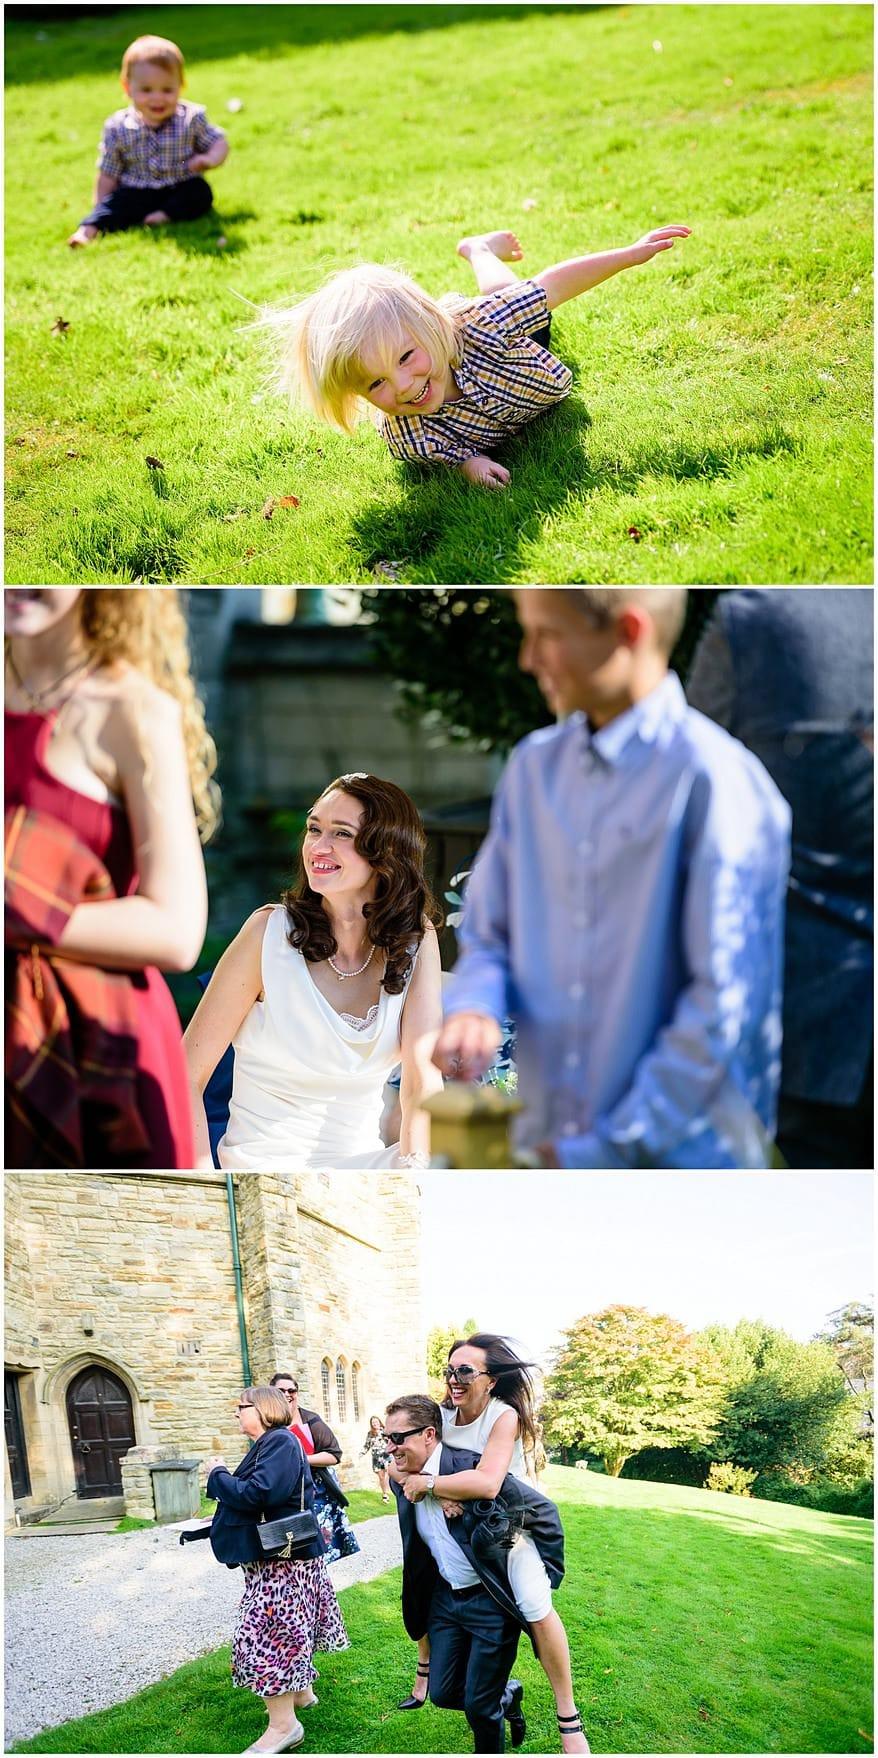 reportage wedding photographs at the alverton hotel in truro